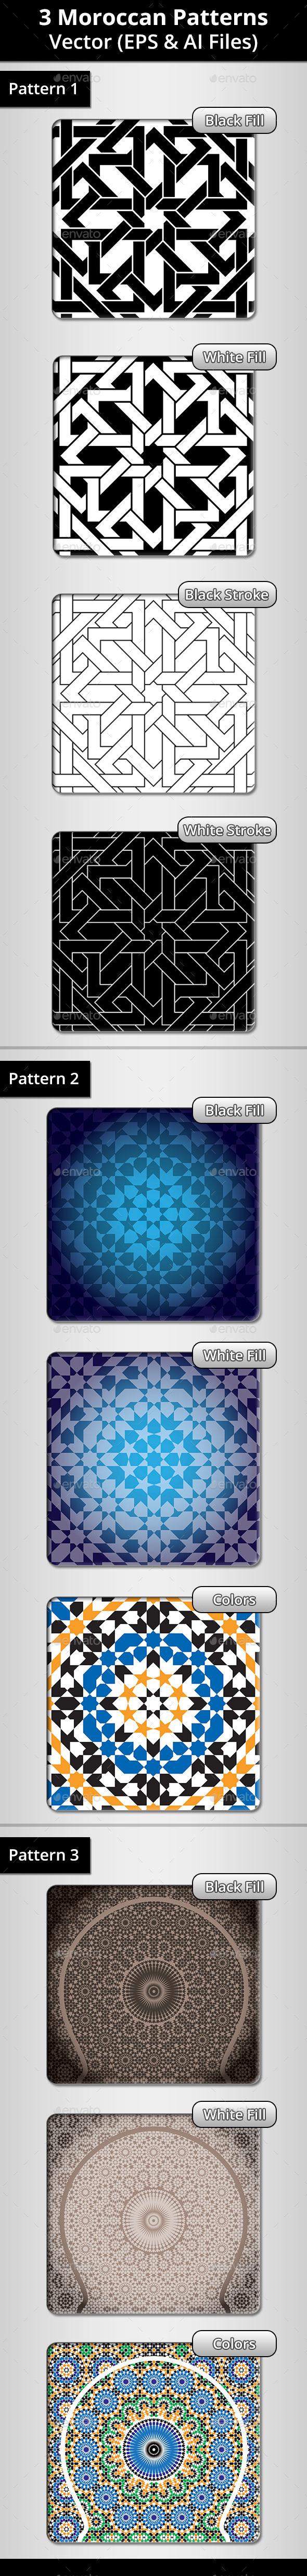 3 Moroccan Patterns Bundle 3 - Patterns Decorative